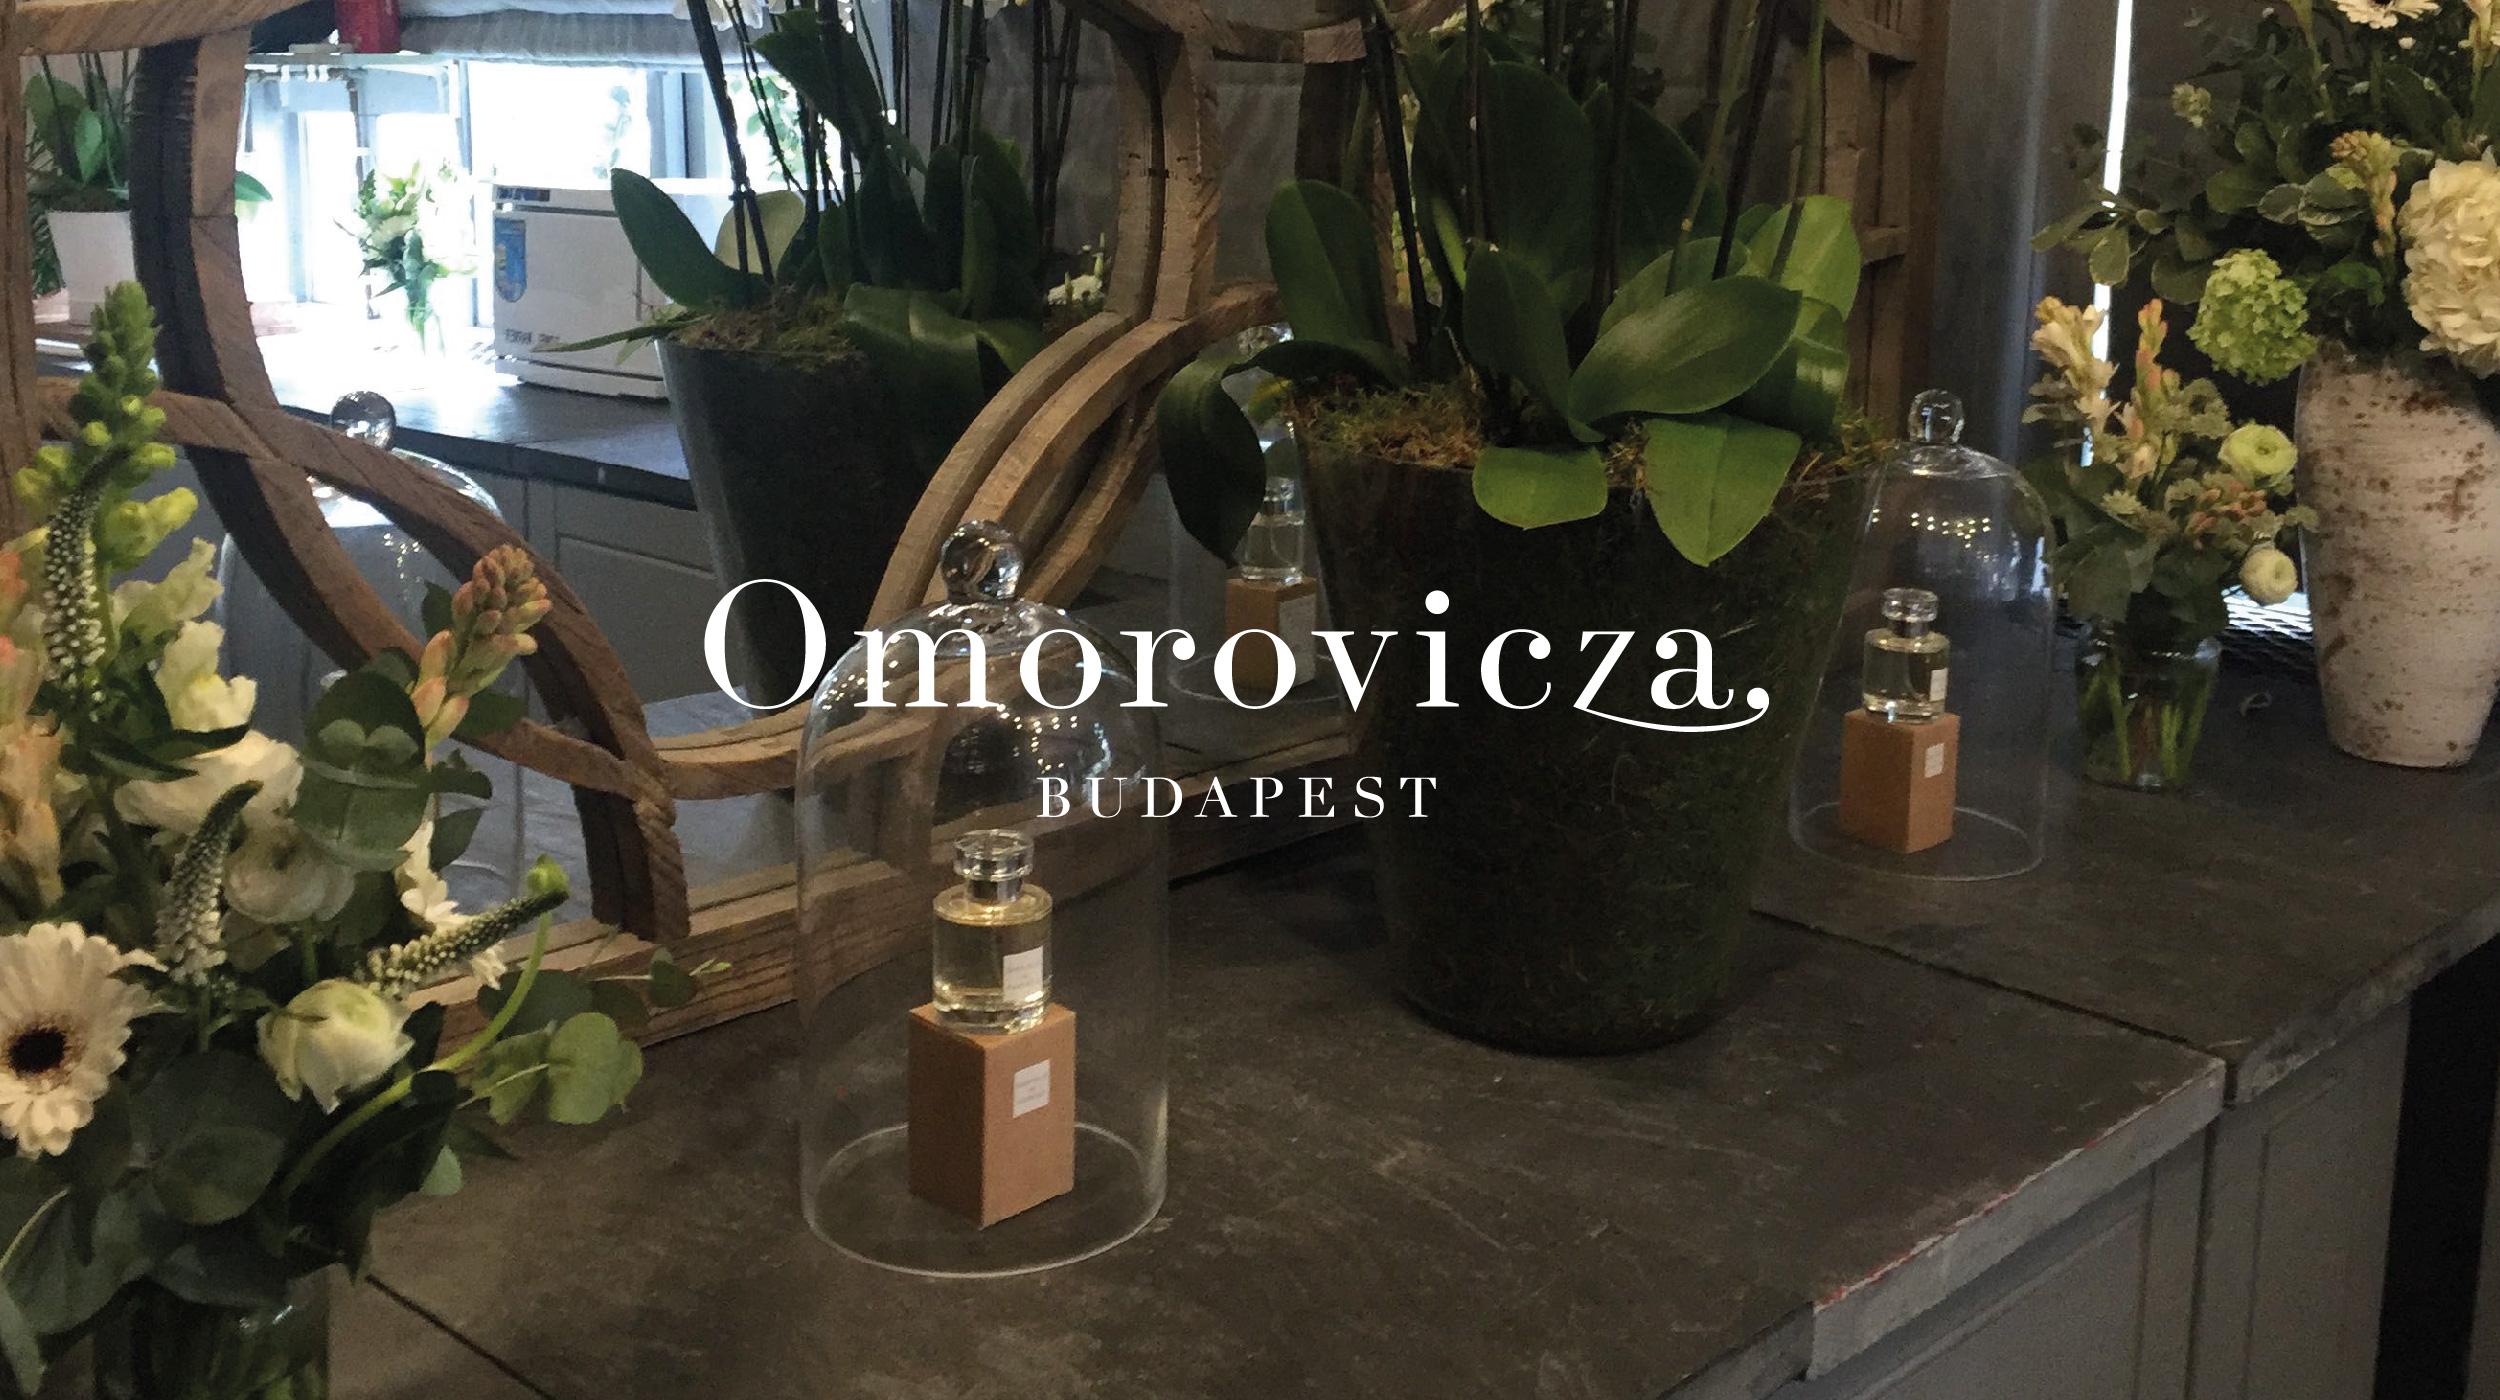 Omorovicza's Pop-up Spa at Clifton Nurseries